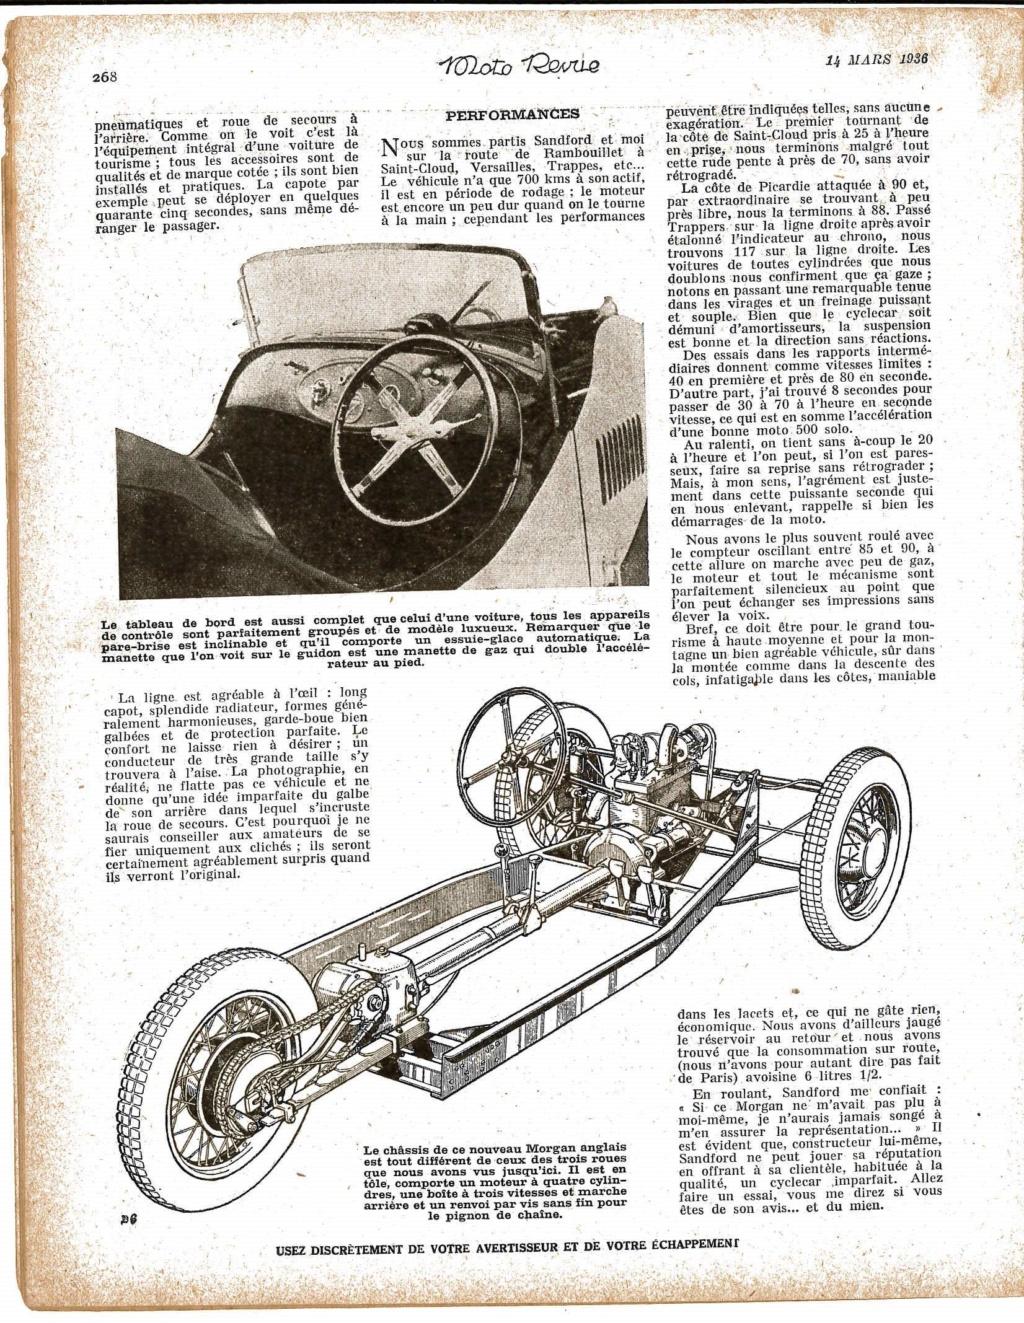 Essai Morgan F2 Moto revue mars 1936 Essai_11